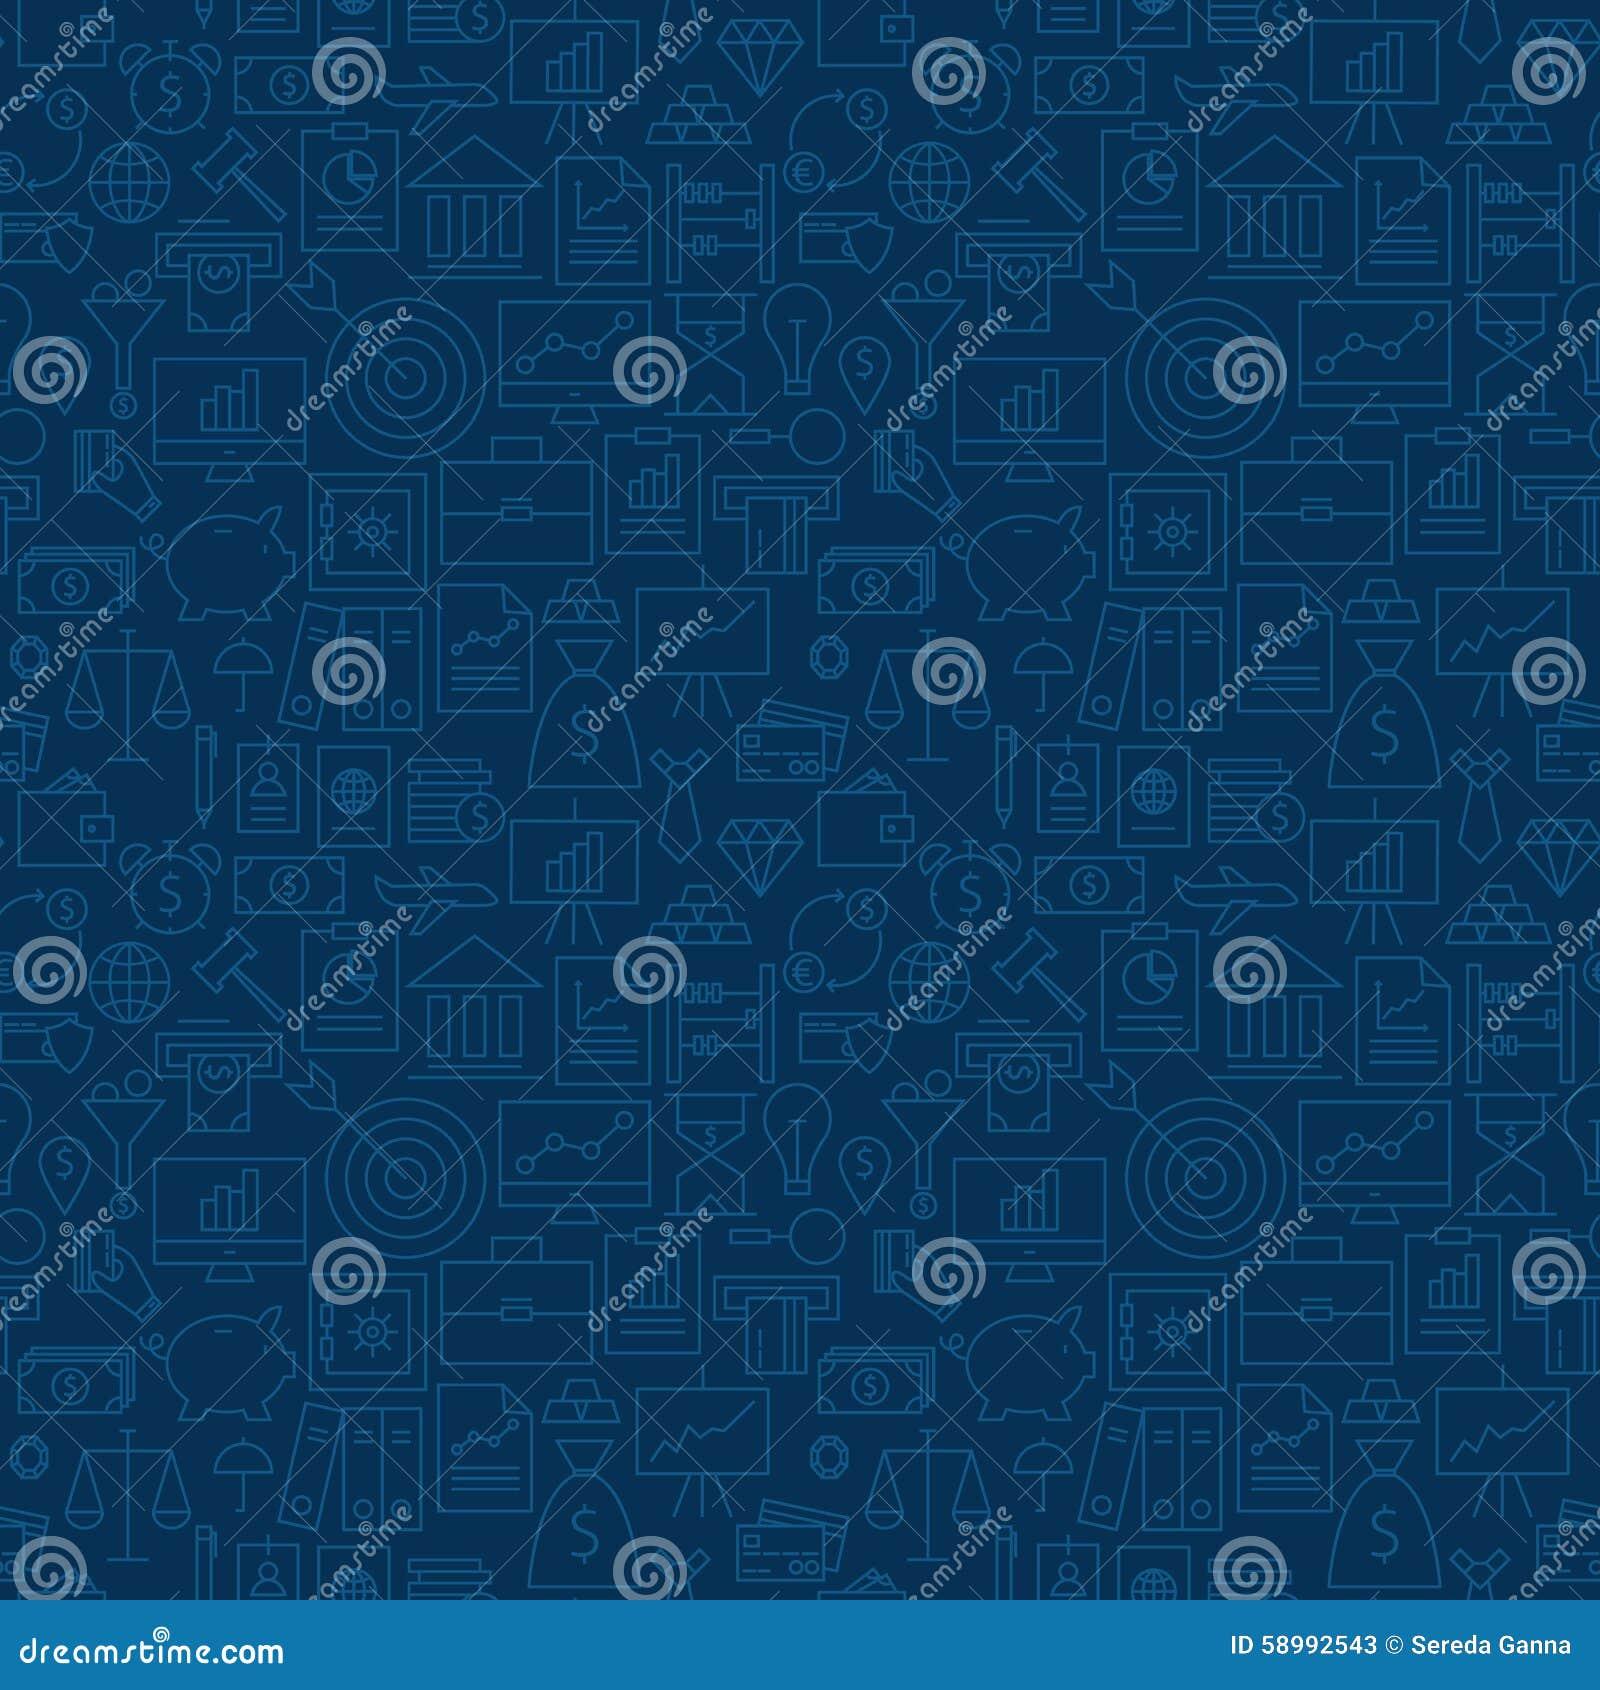 Thin Line Finance Business Money Seamless Blue Pattern